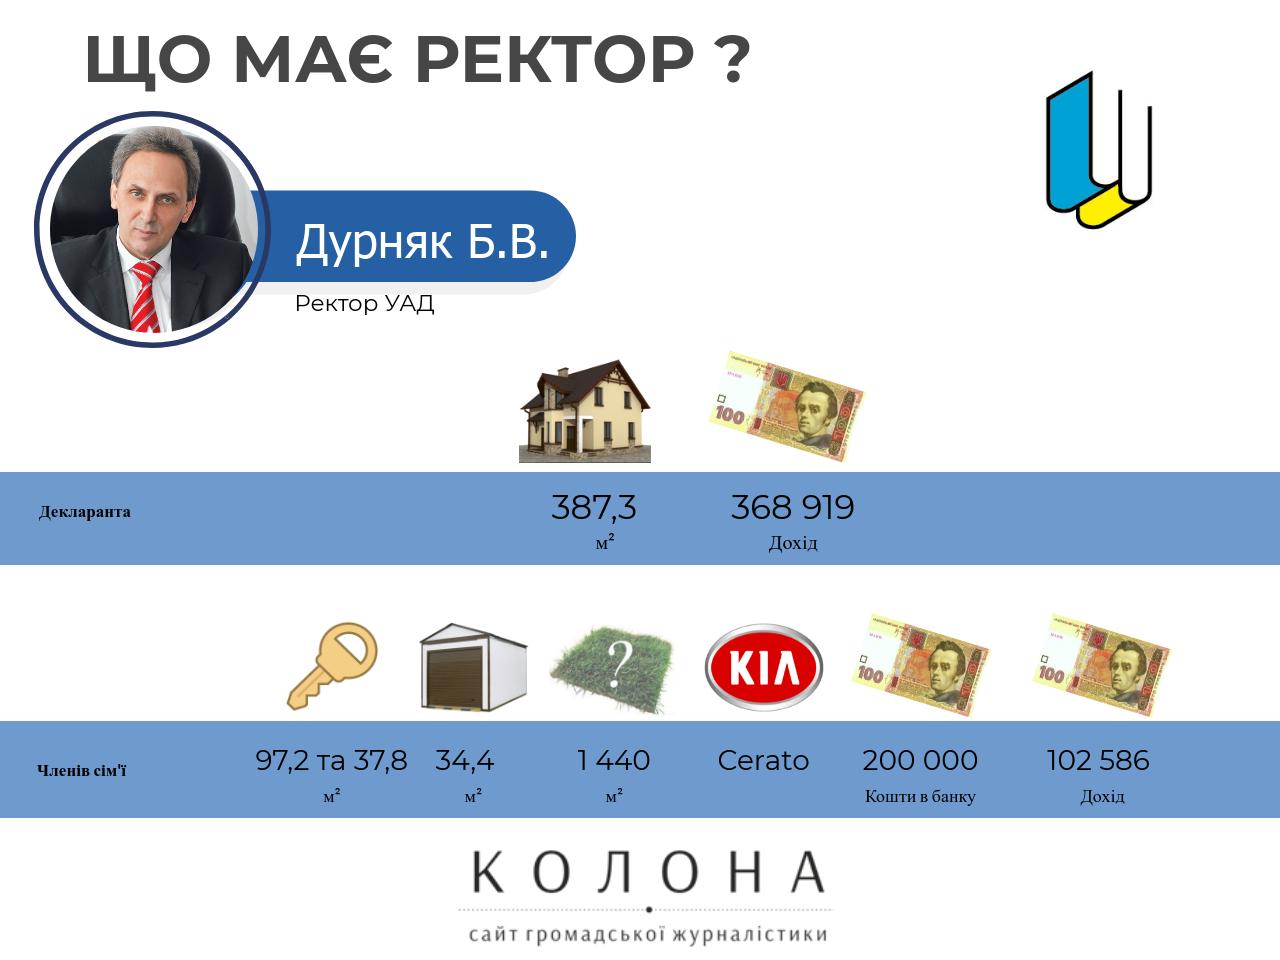 Дурняк Богдан Васильович